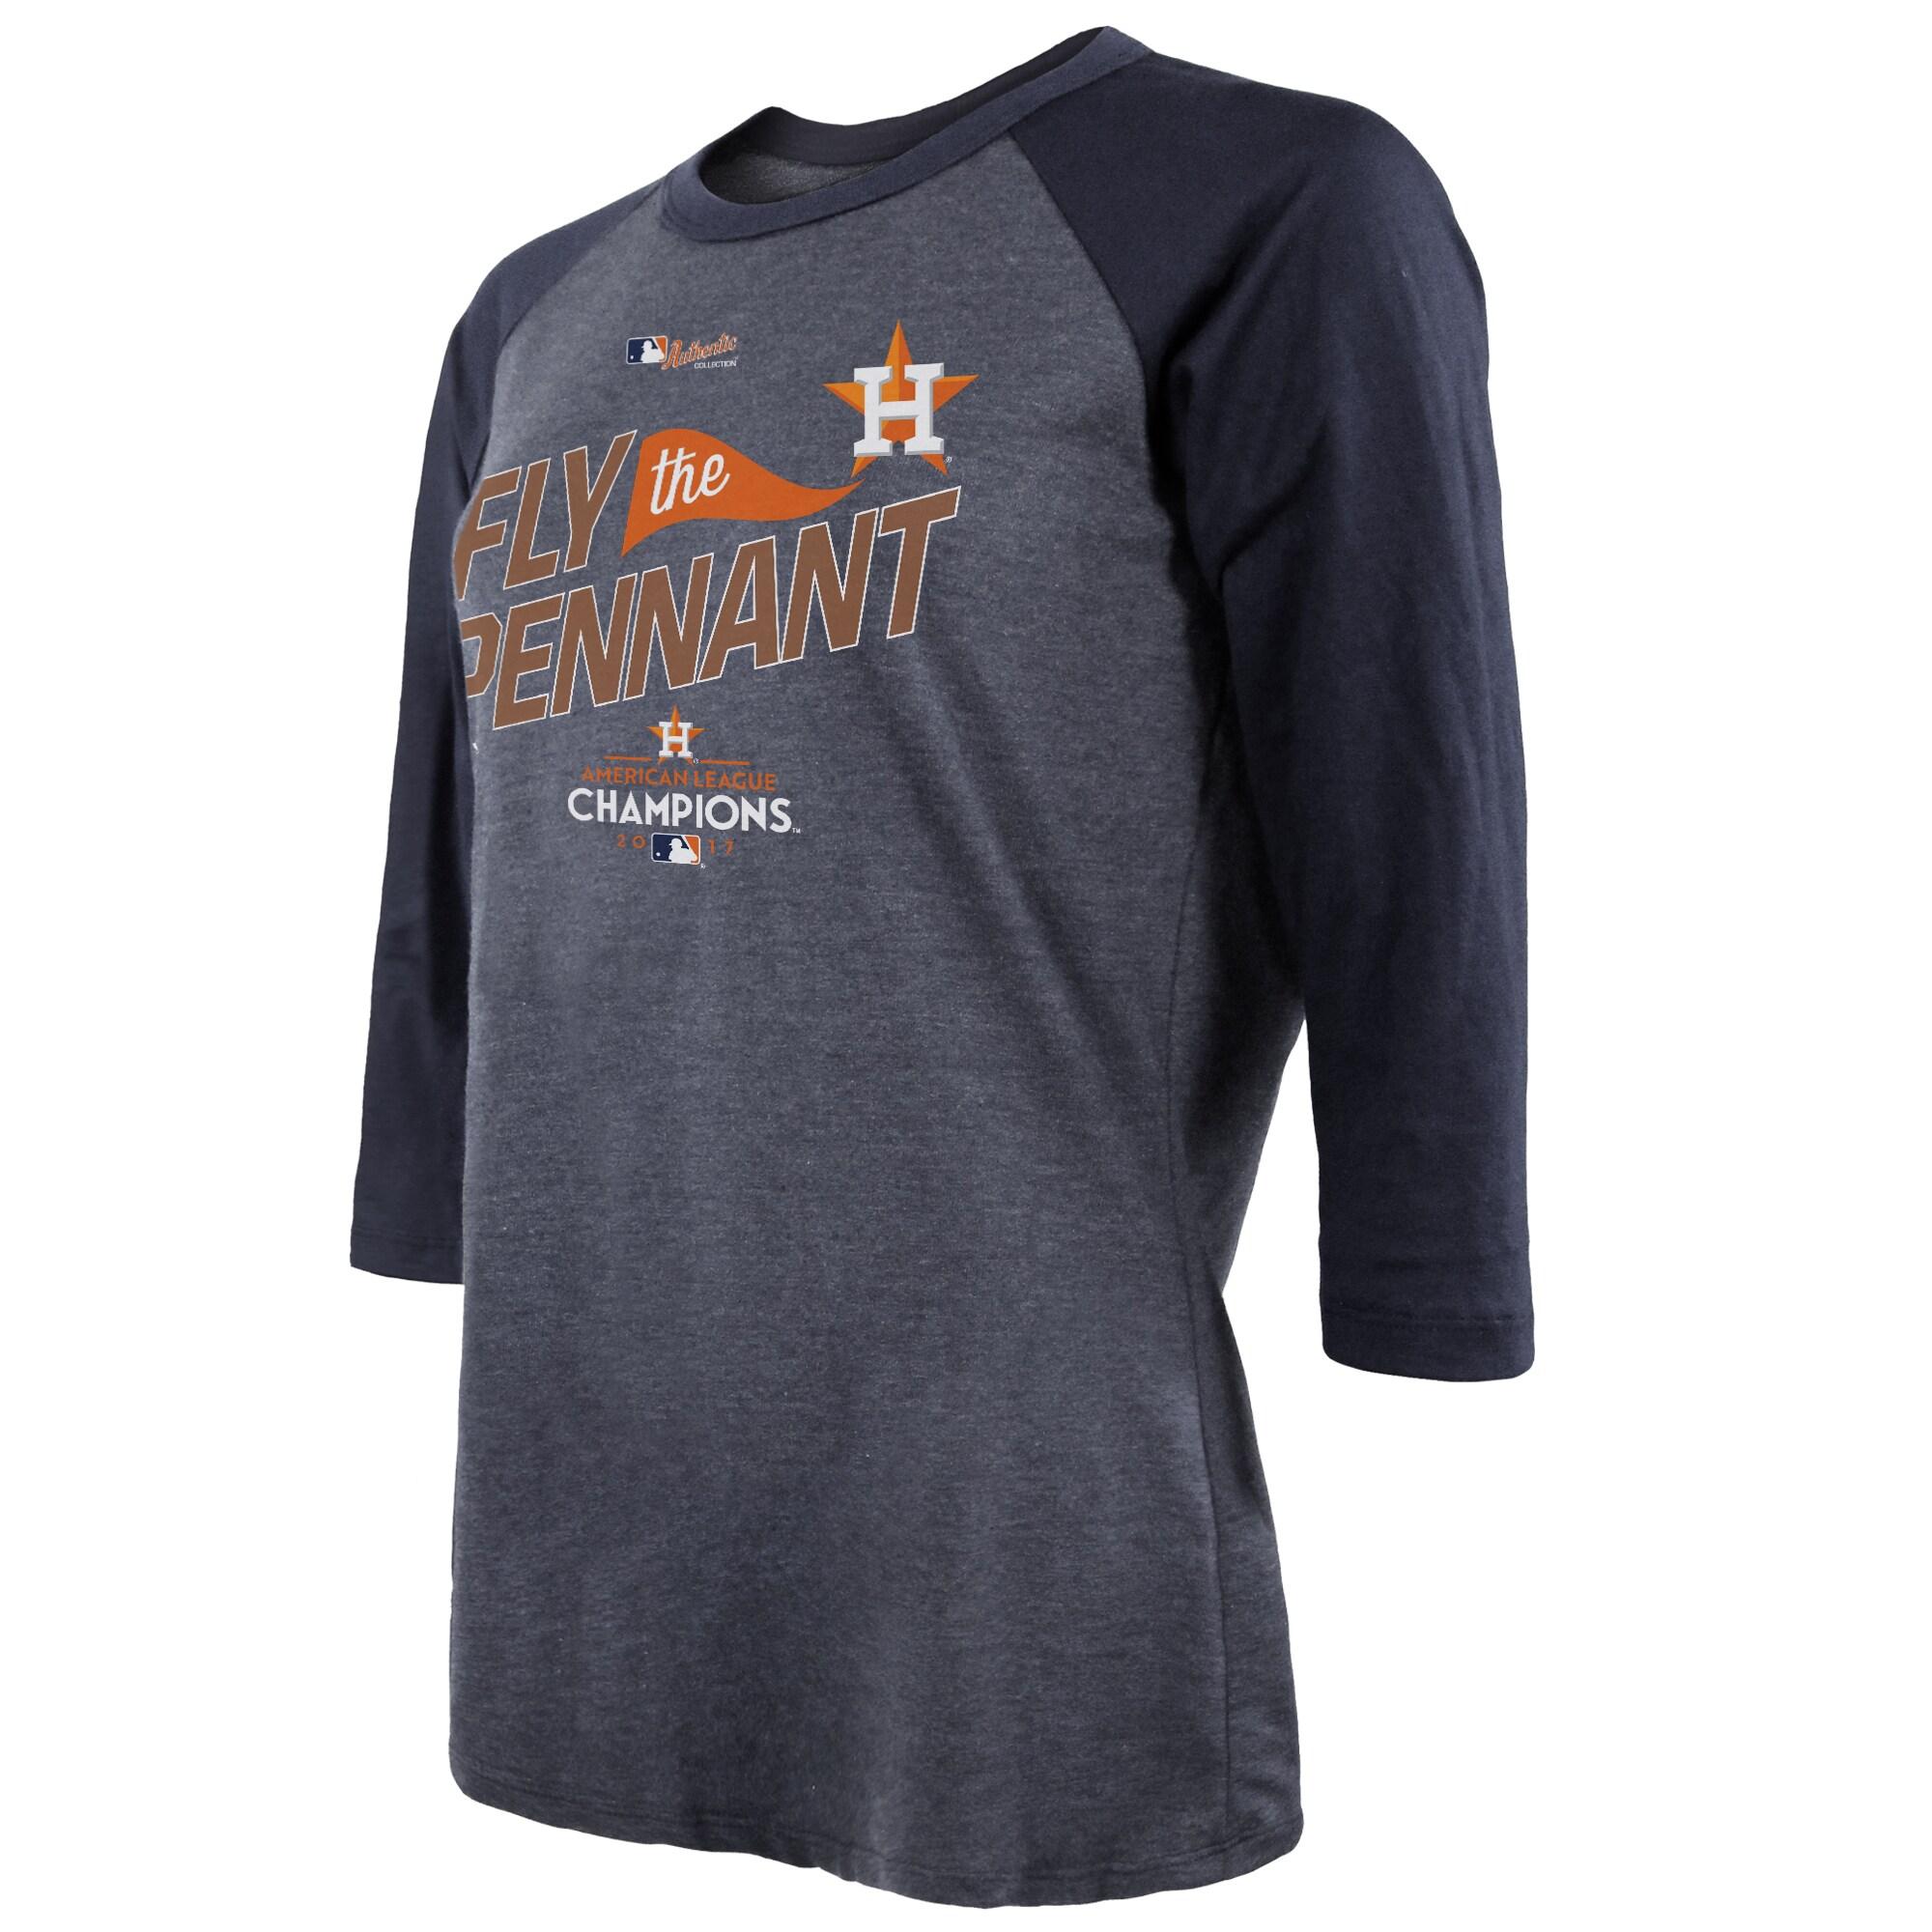 Houston Astros Majestic Threads Women's 2017 American League Champions Locker Room Tri-Blend 3/4 Sleeve Raglan T-Shirt - Navy